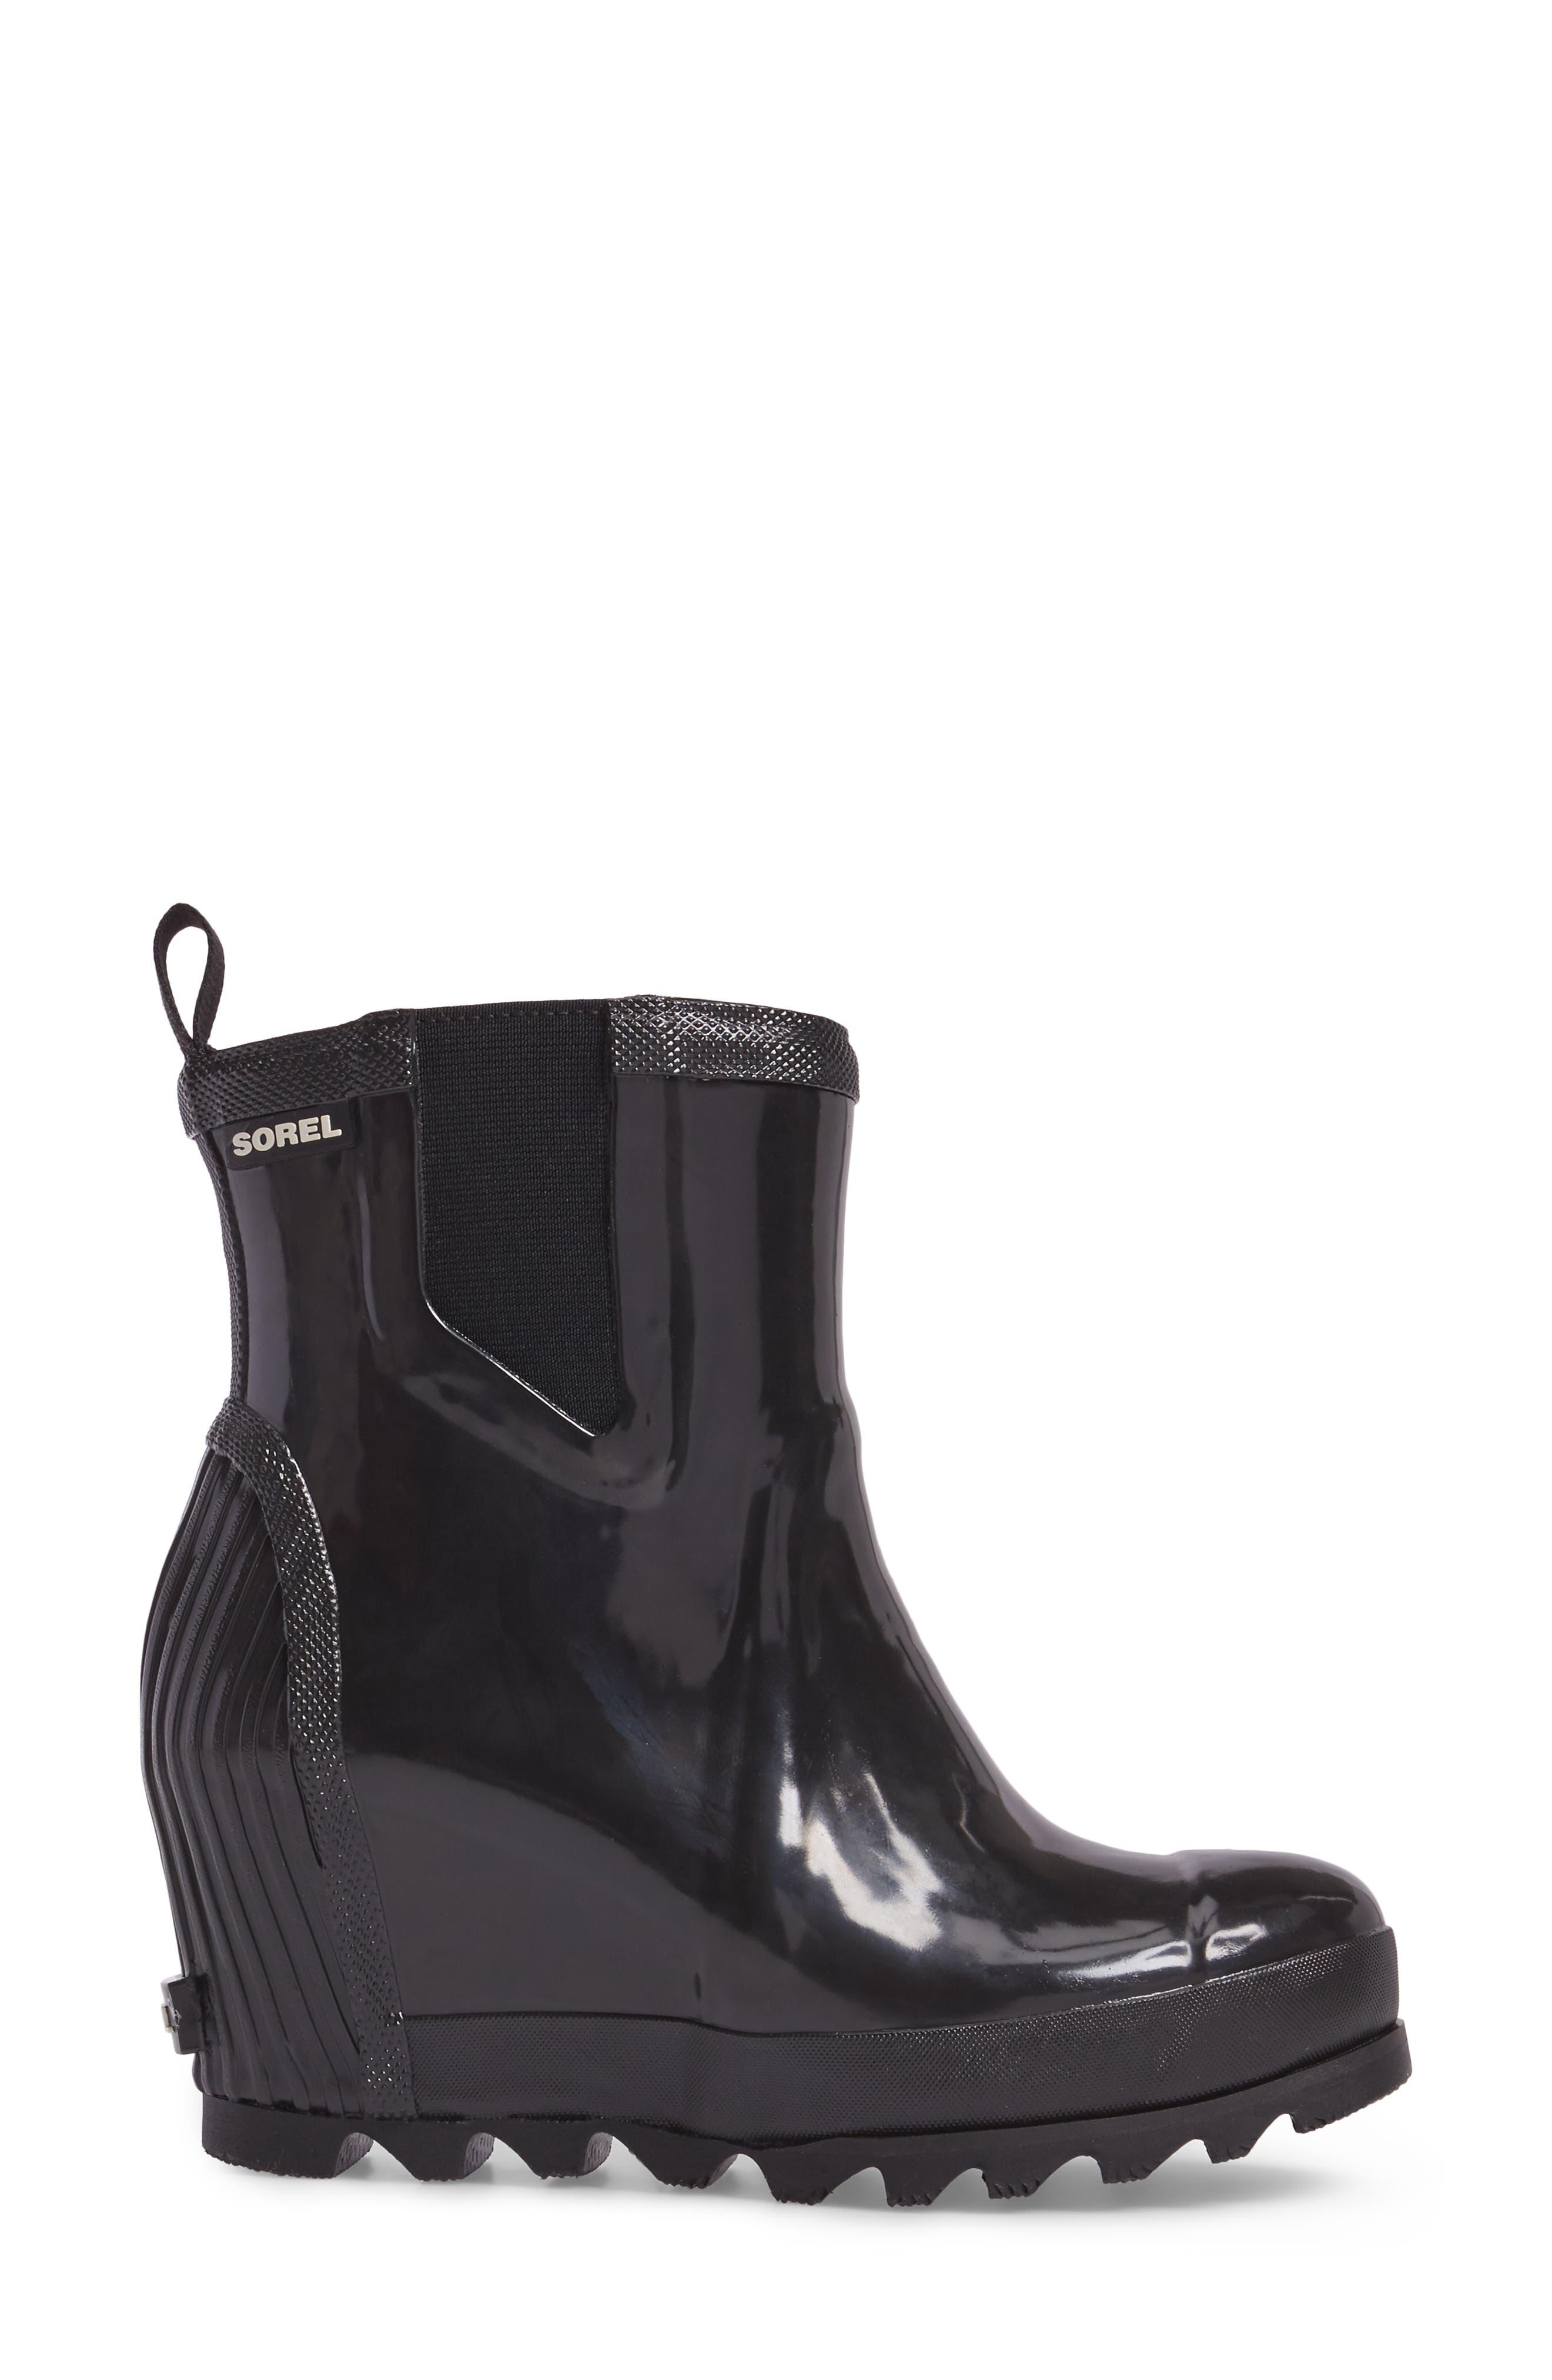 SOREL, Joan Glossy Wedge Waterproof Rain Boot, Alternate thumbnail 3, color, BLACK/ SEA SALT